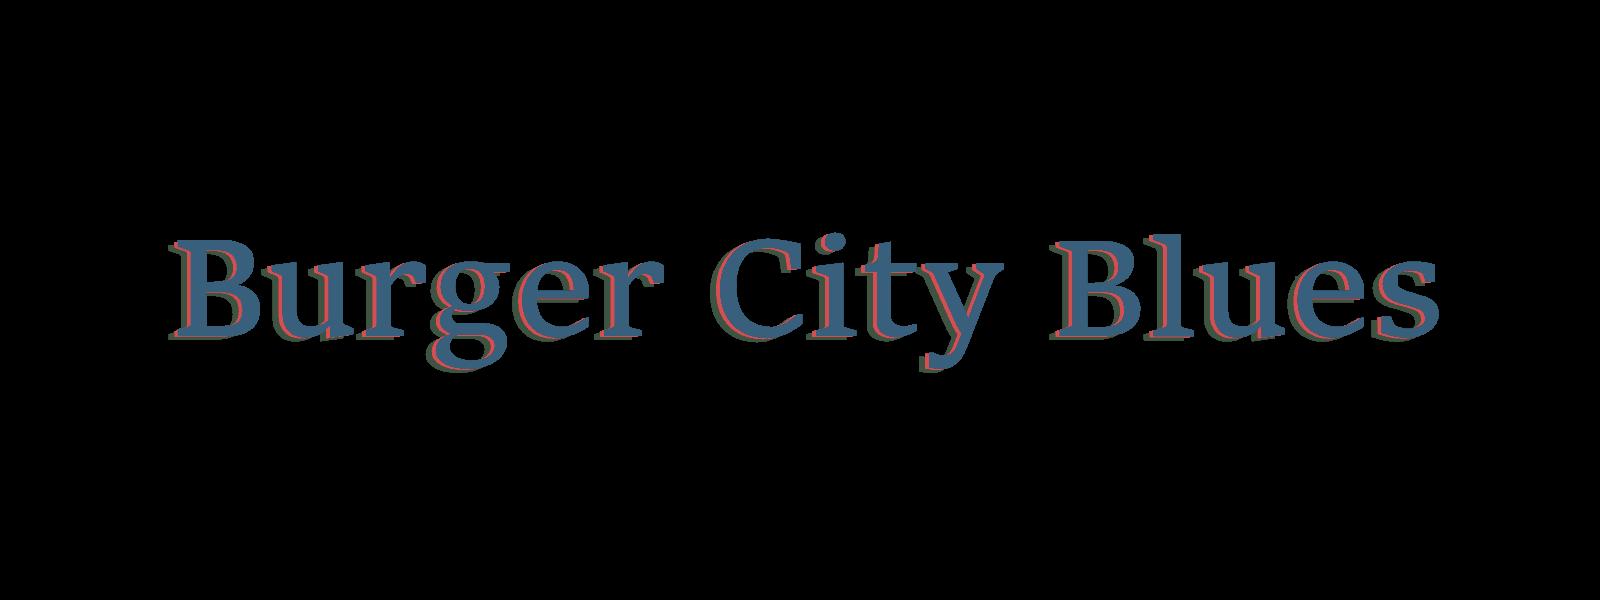 Burger City Blues